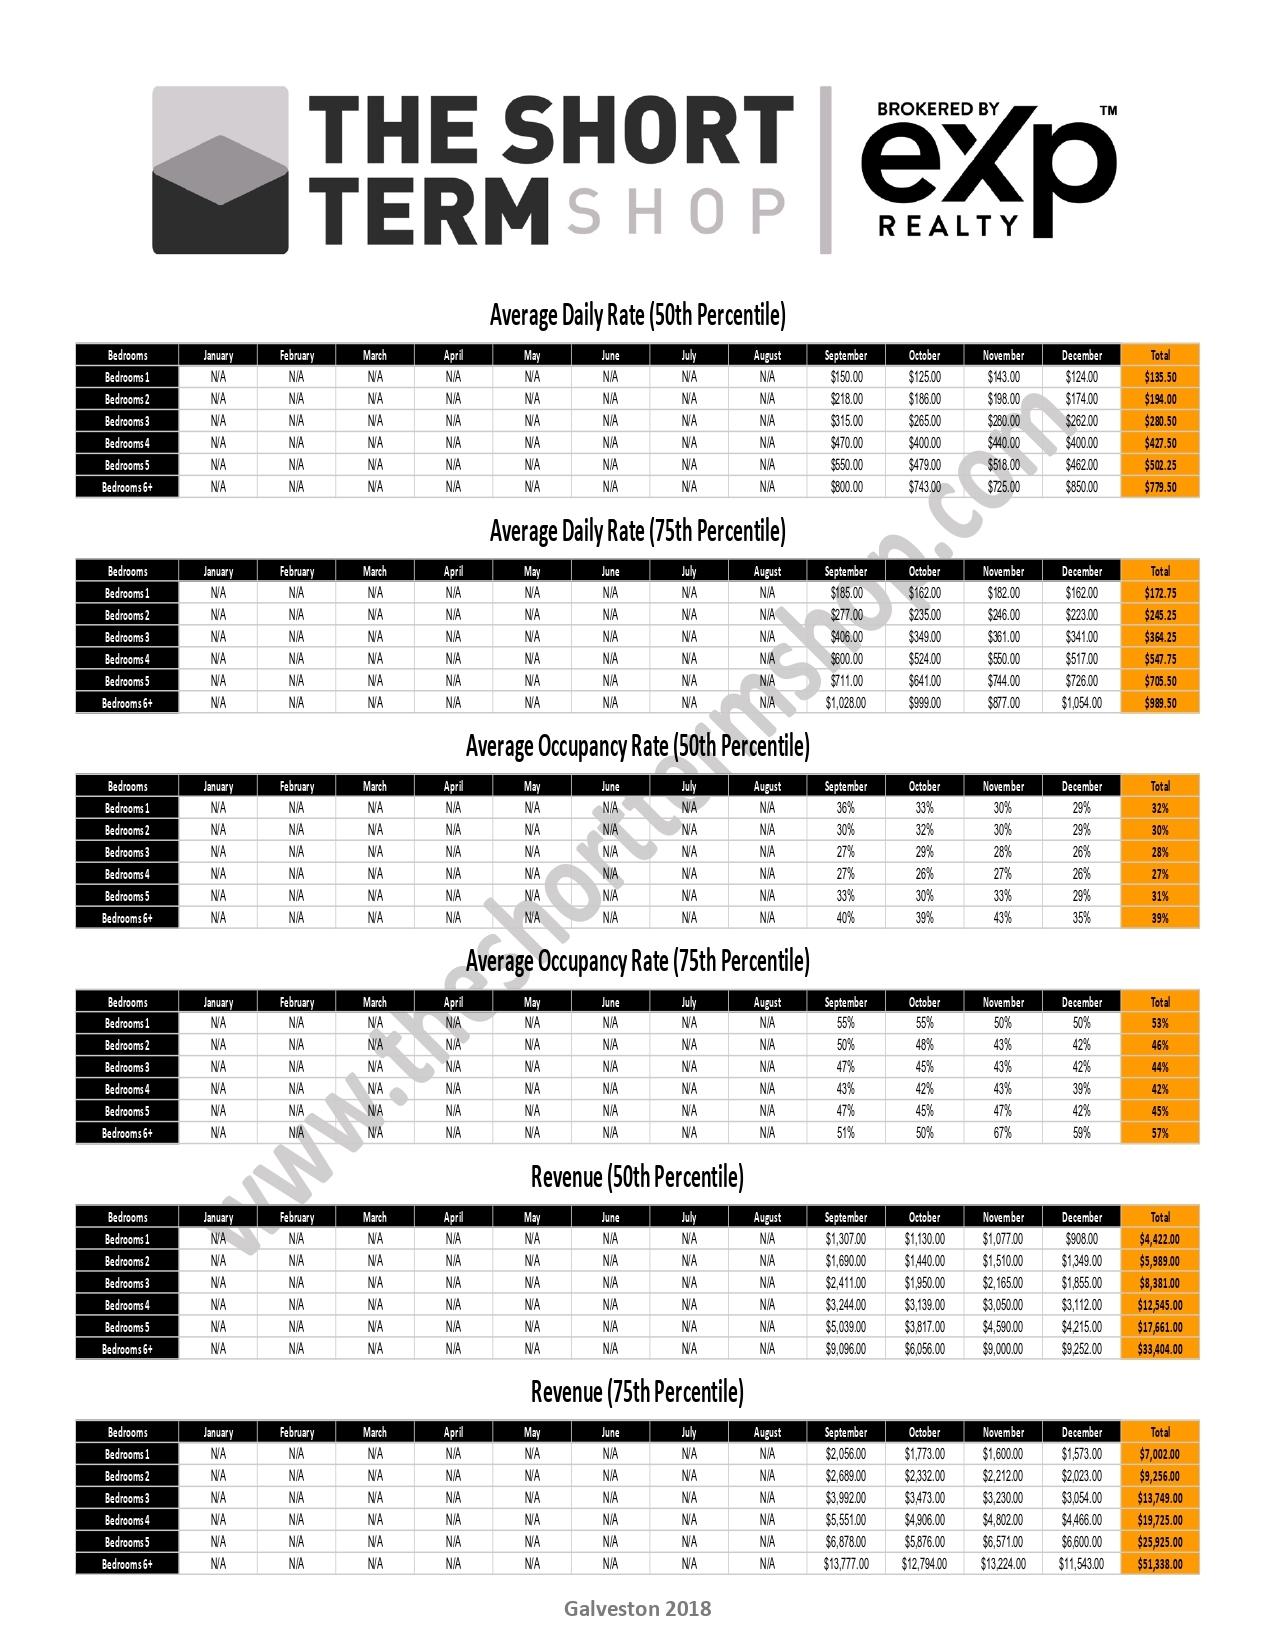 Galveston Short Term Rental Data 2018